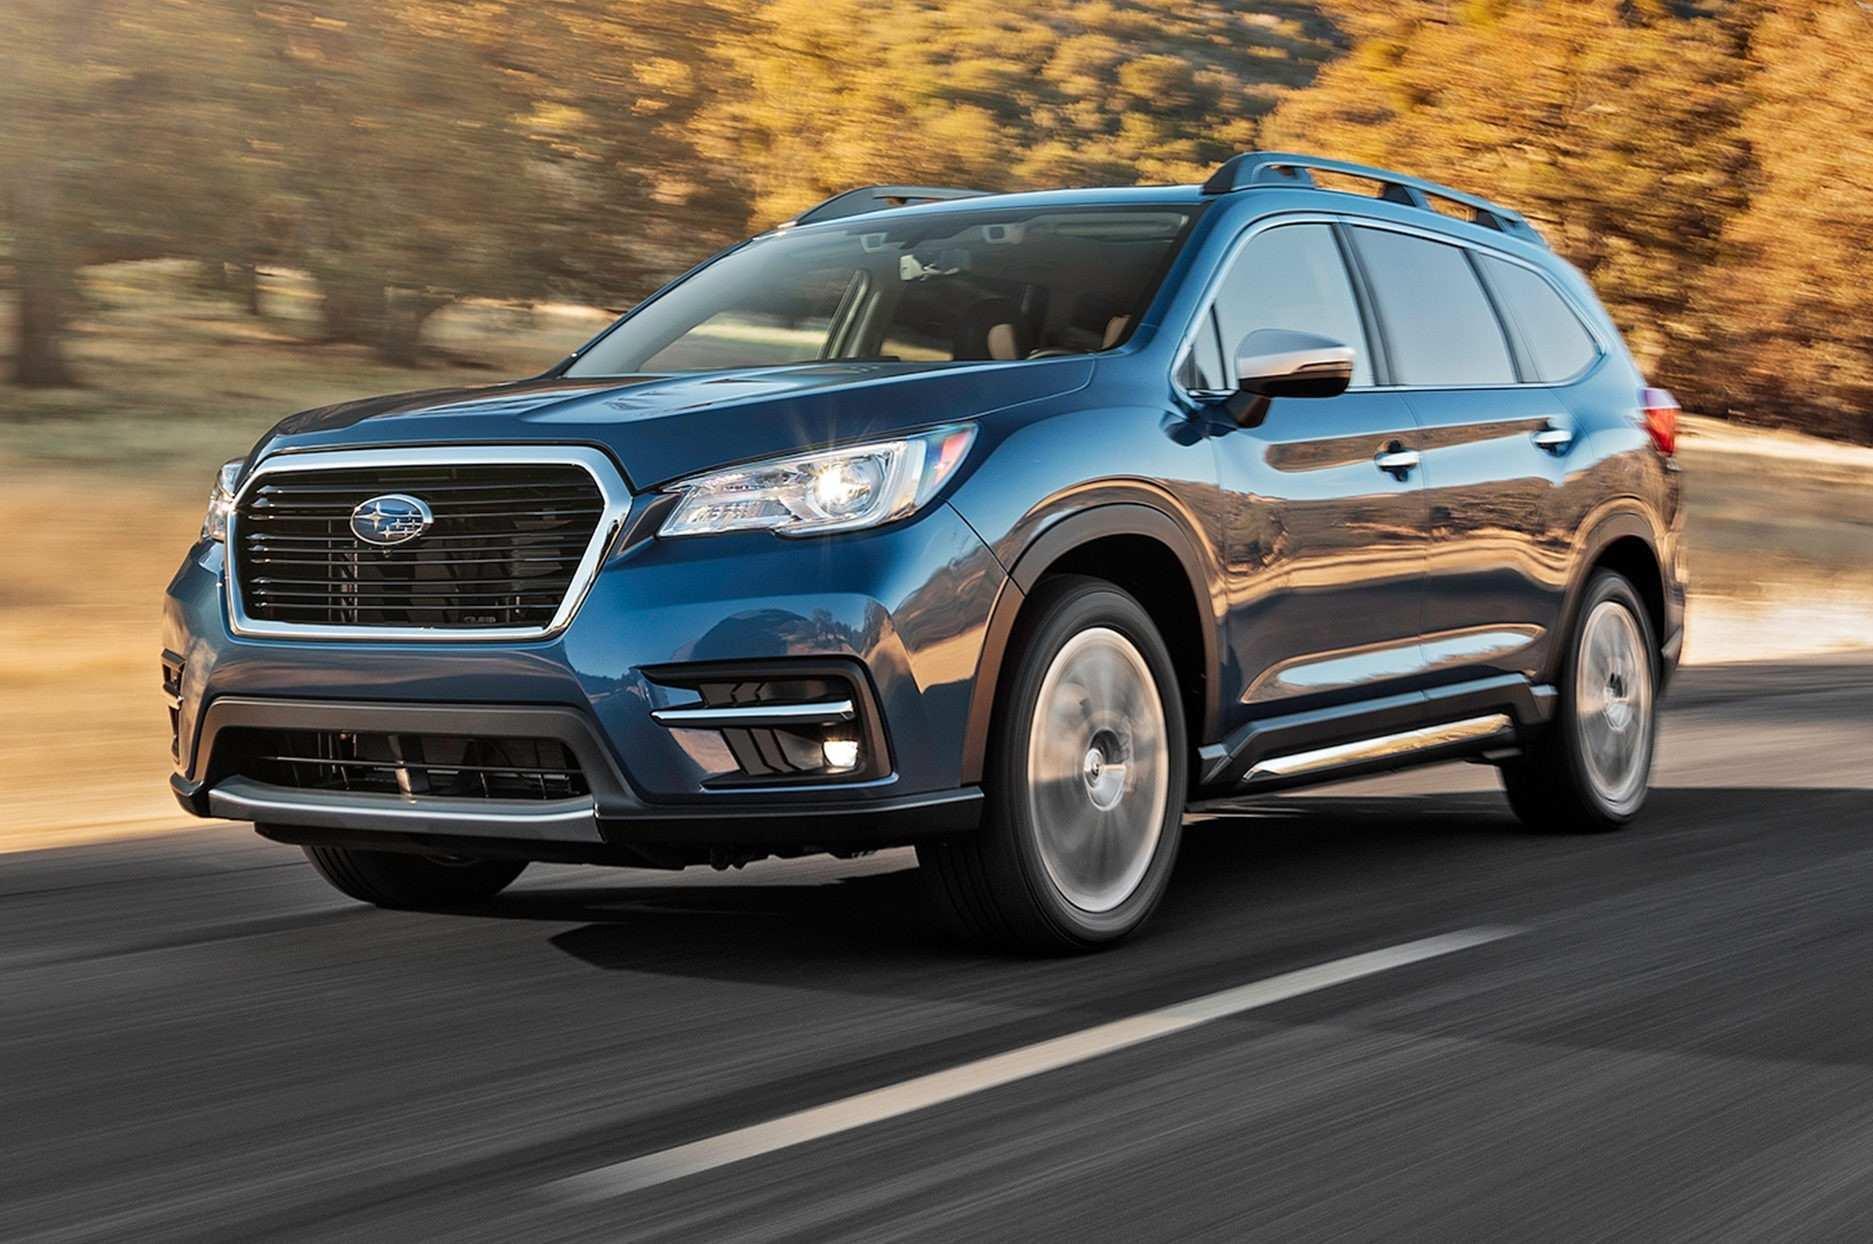 94 Great 2019 Subaru Brat First Drive Rumors by 2019 Subaru Brat First Drive